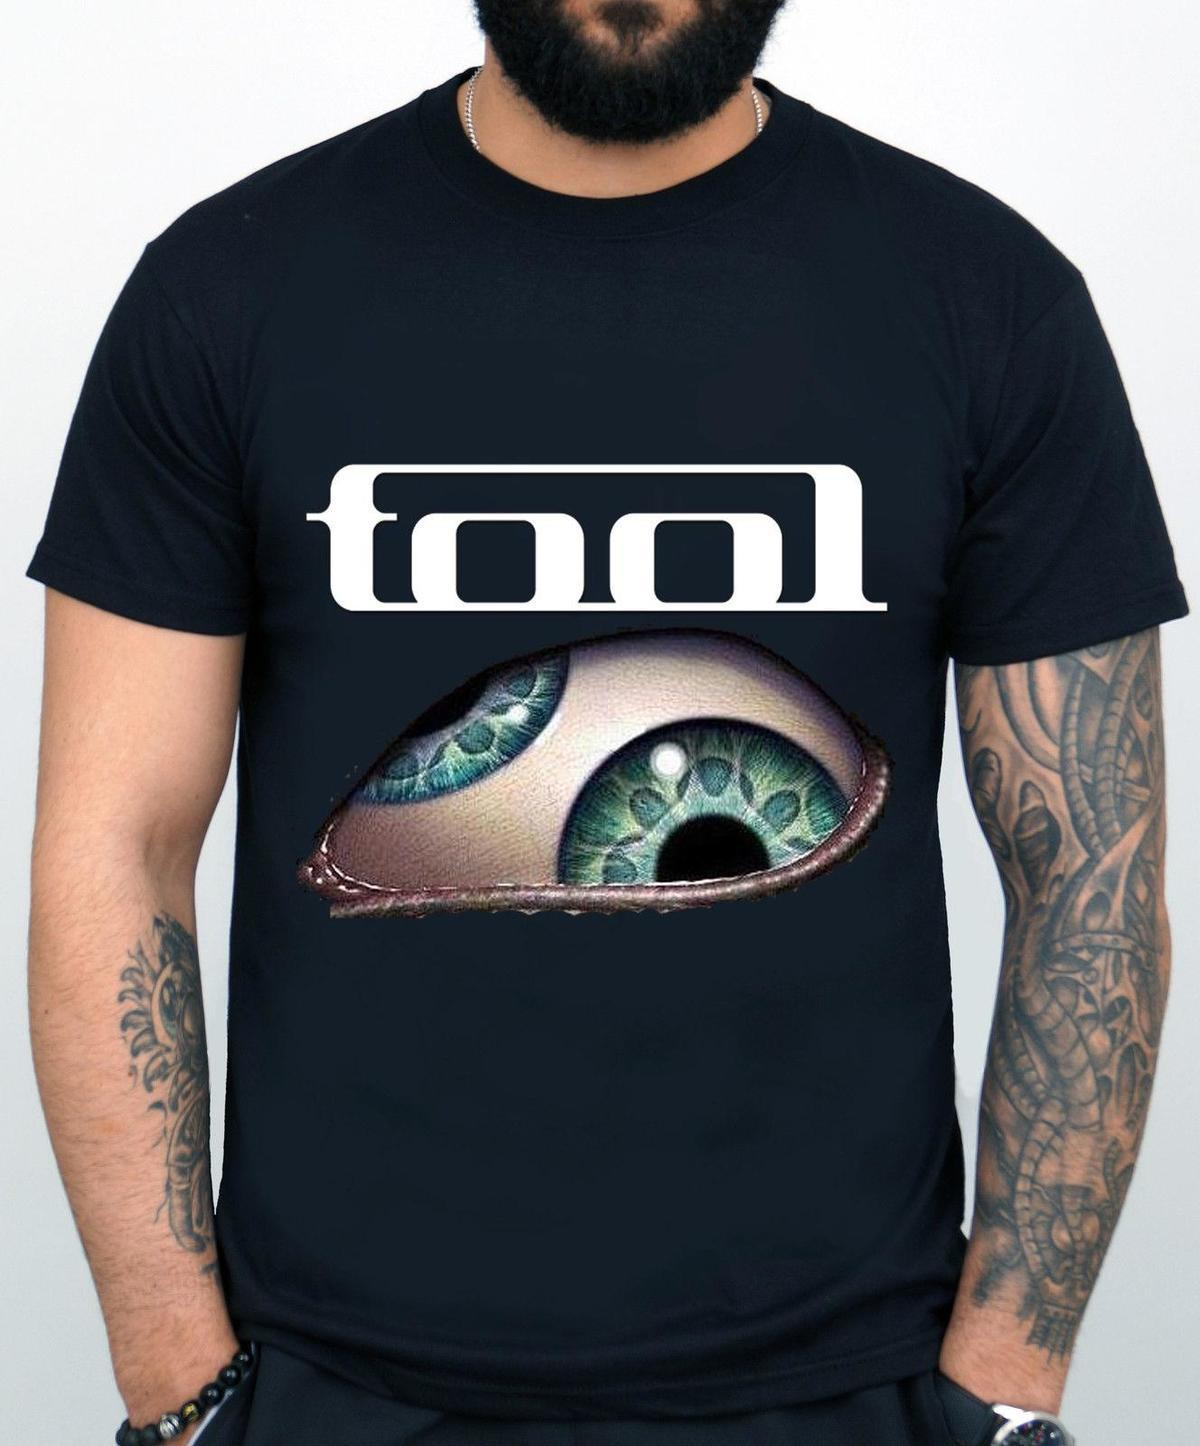 official photos 02144 81255 Tool Band T-shirt Rock Band T-Shirt Rock Band Tool T-shirt Black New